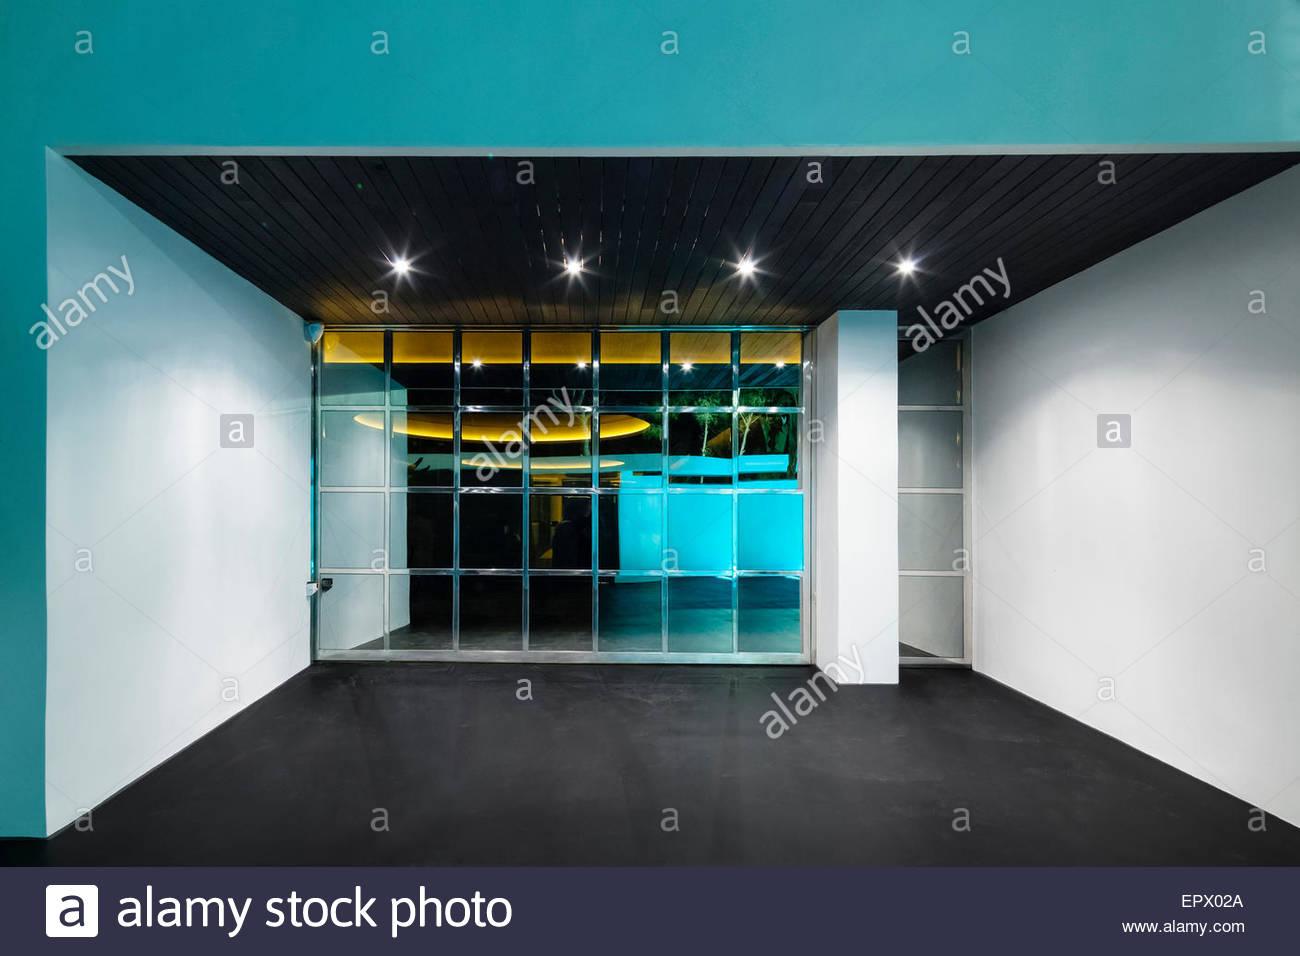 Spotlit garage in Alani Casa, Sitges, Barcelona, Catalonia, Spain - Stock Image